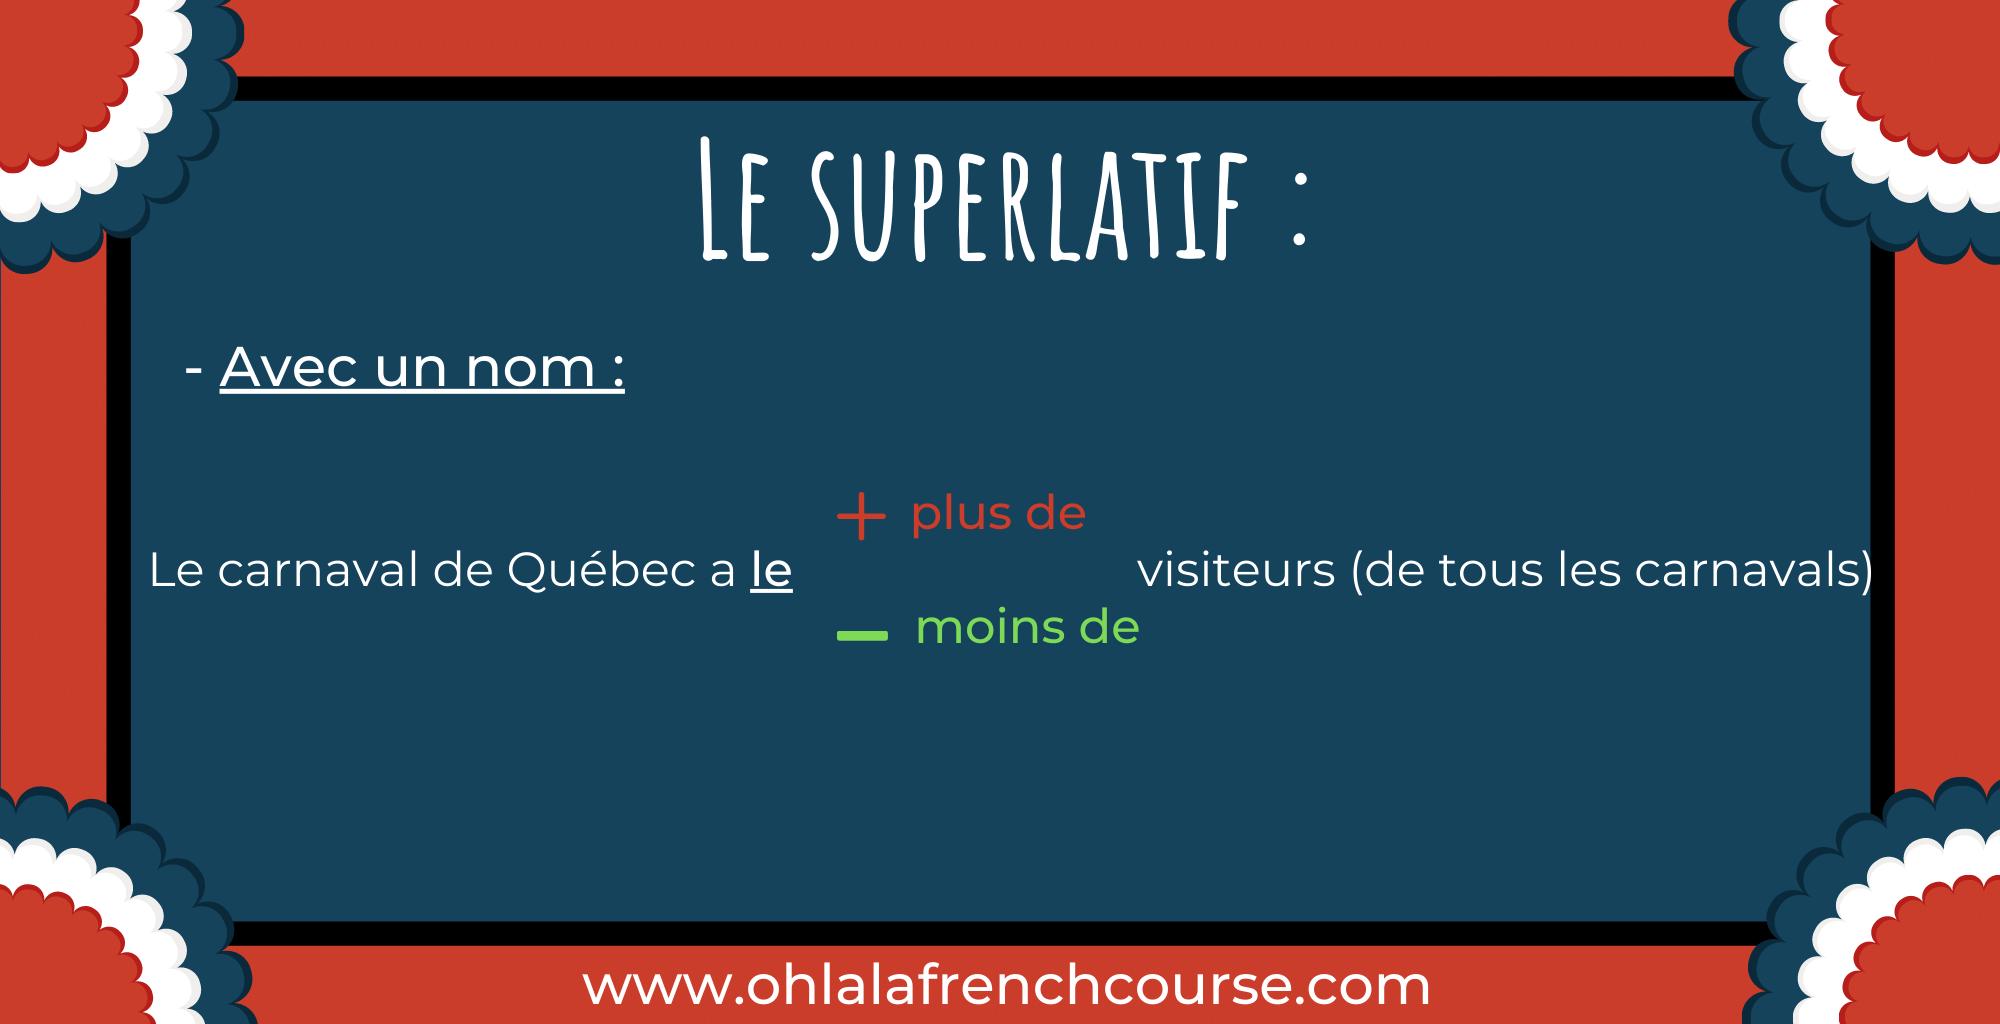 Le superlatif - Lesuperlatif avec un nom :